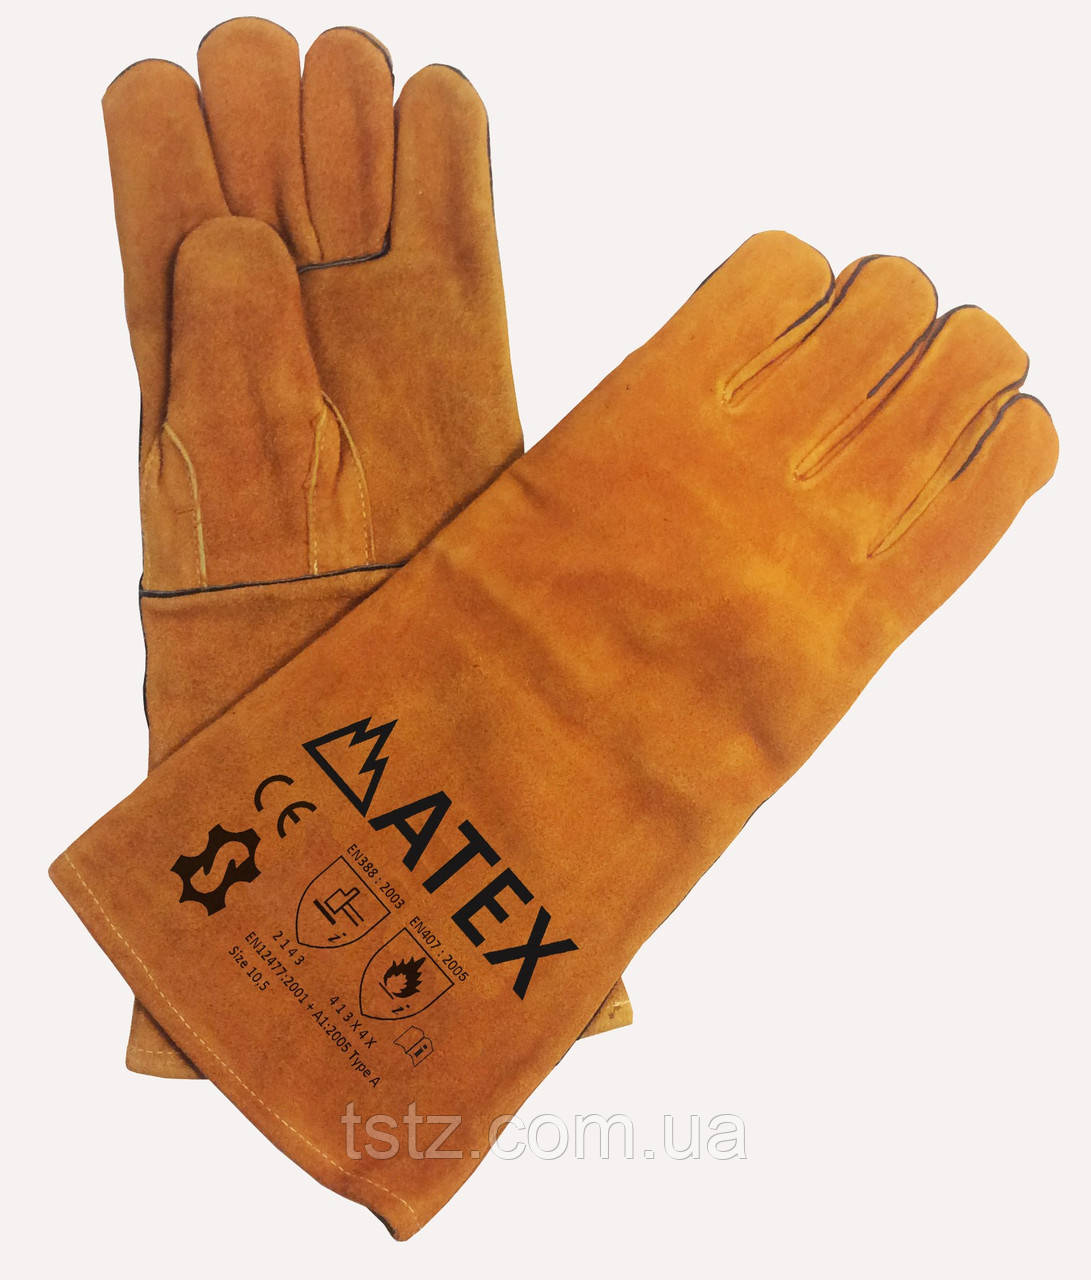 Перчатки-краги желтые кожаные